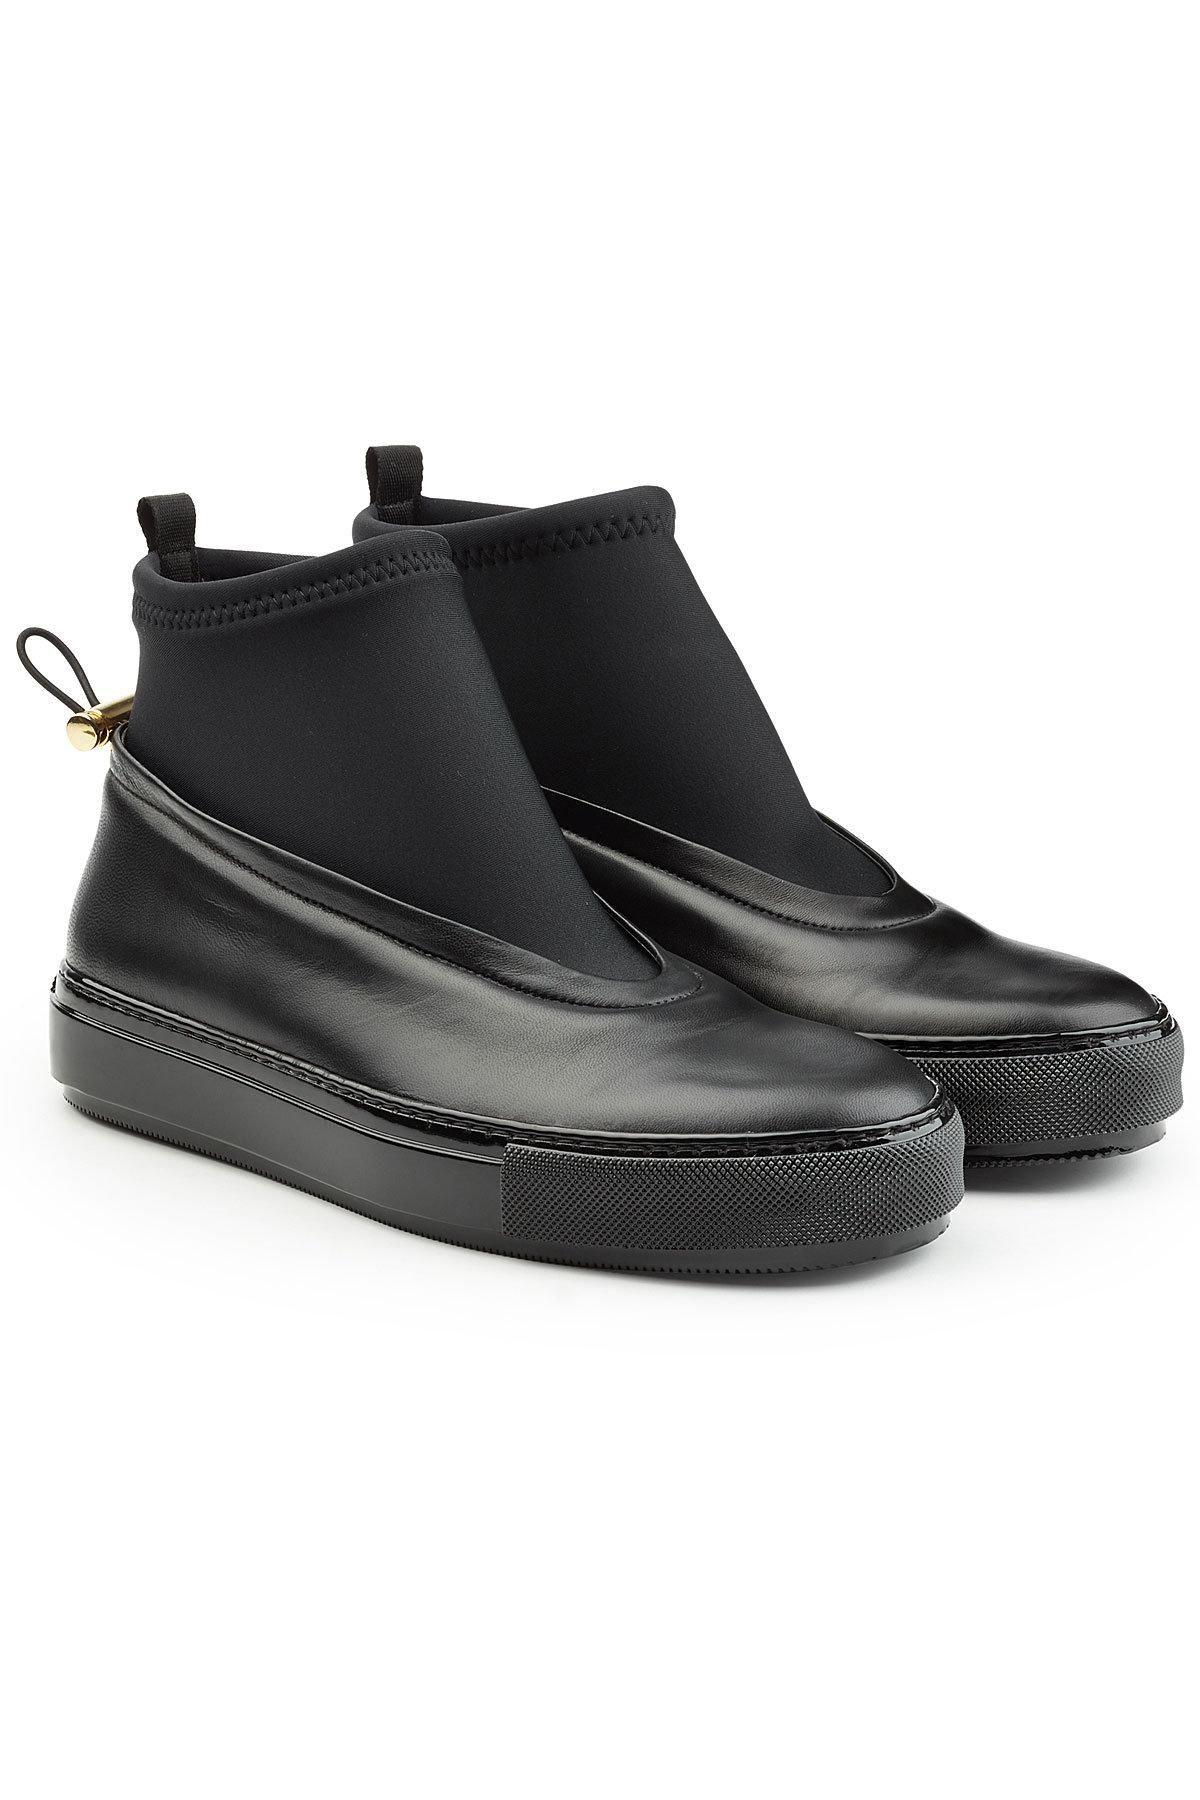 san francisco cee86 1bfbd STYLEBOP.com (FRNLIT) - Marni Marni Leather Sock Sneakers - AdoreWe.com